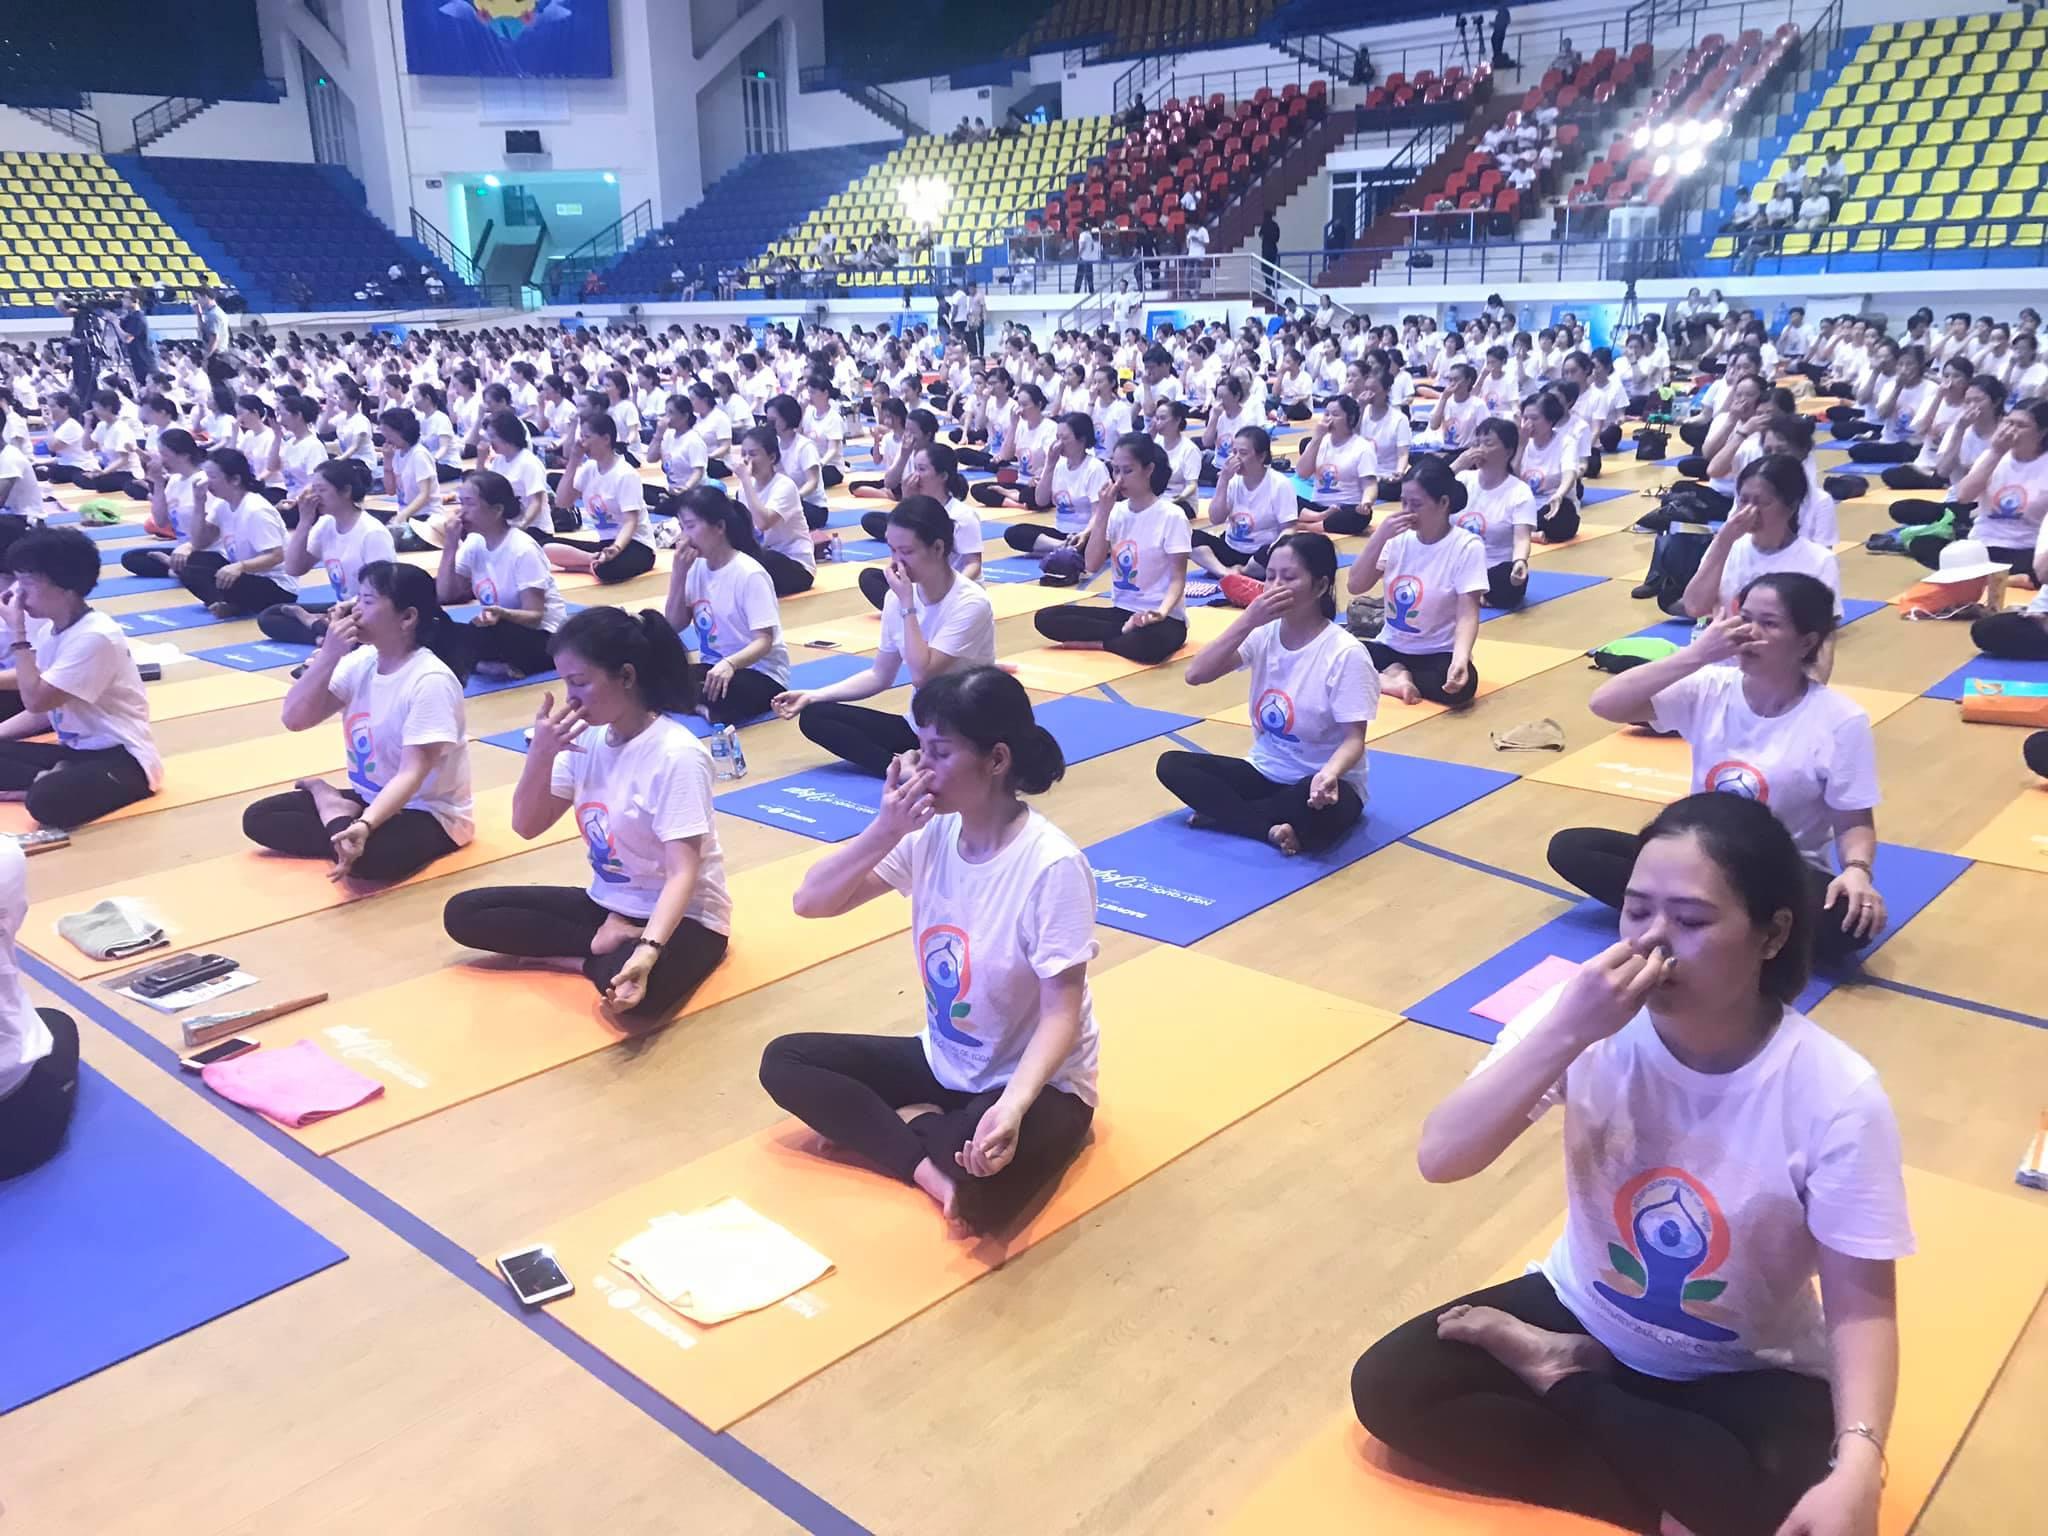 bvnt-tai-tro-ngay-hoi-quoc-te-yoga-2019-1